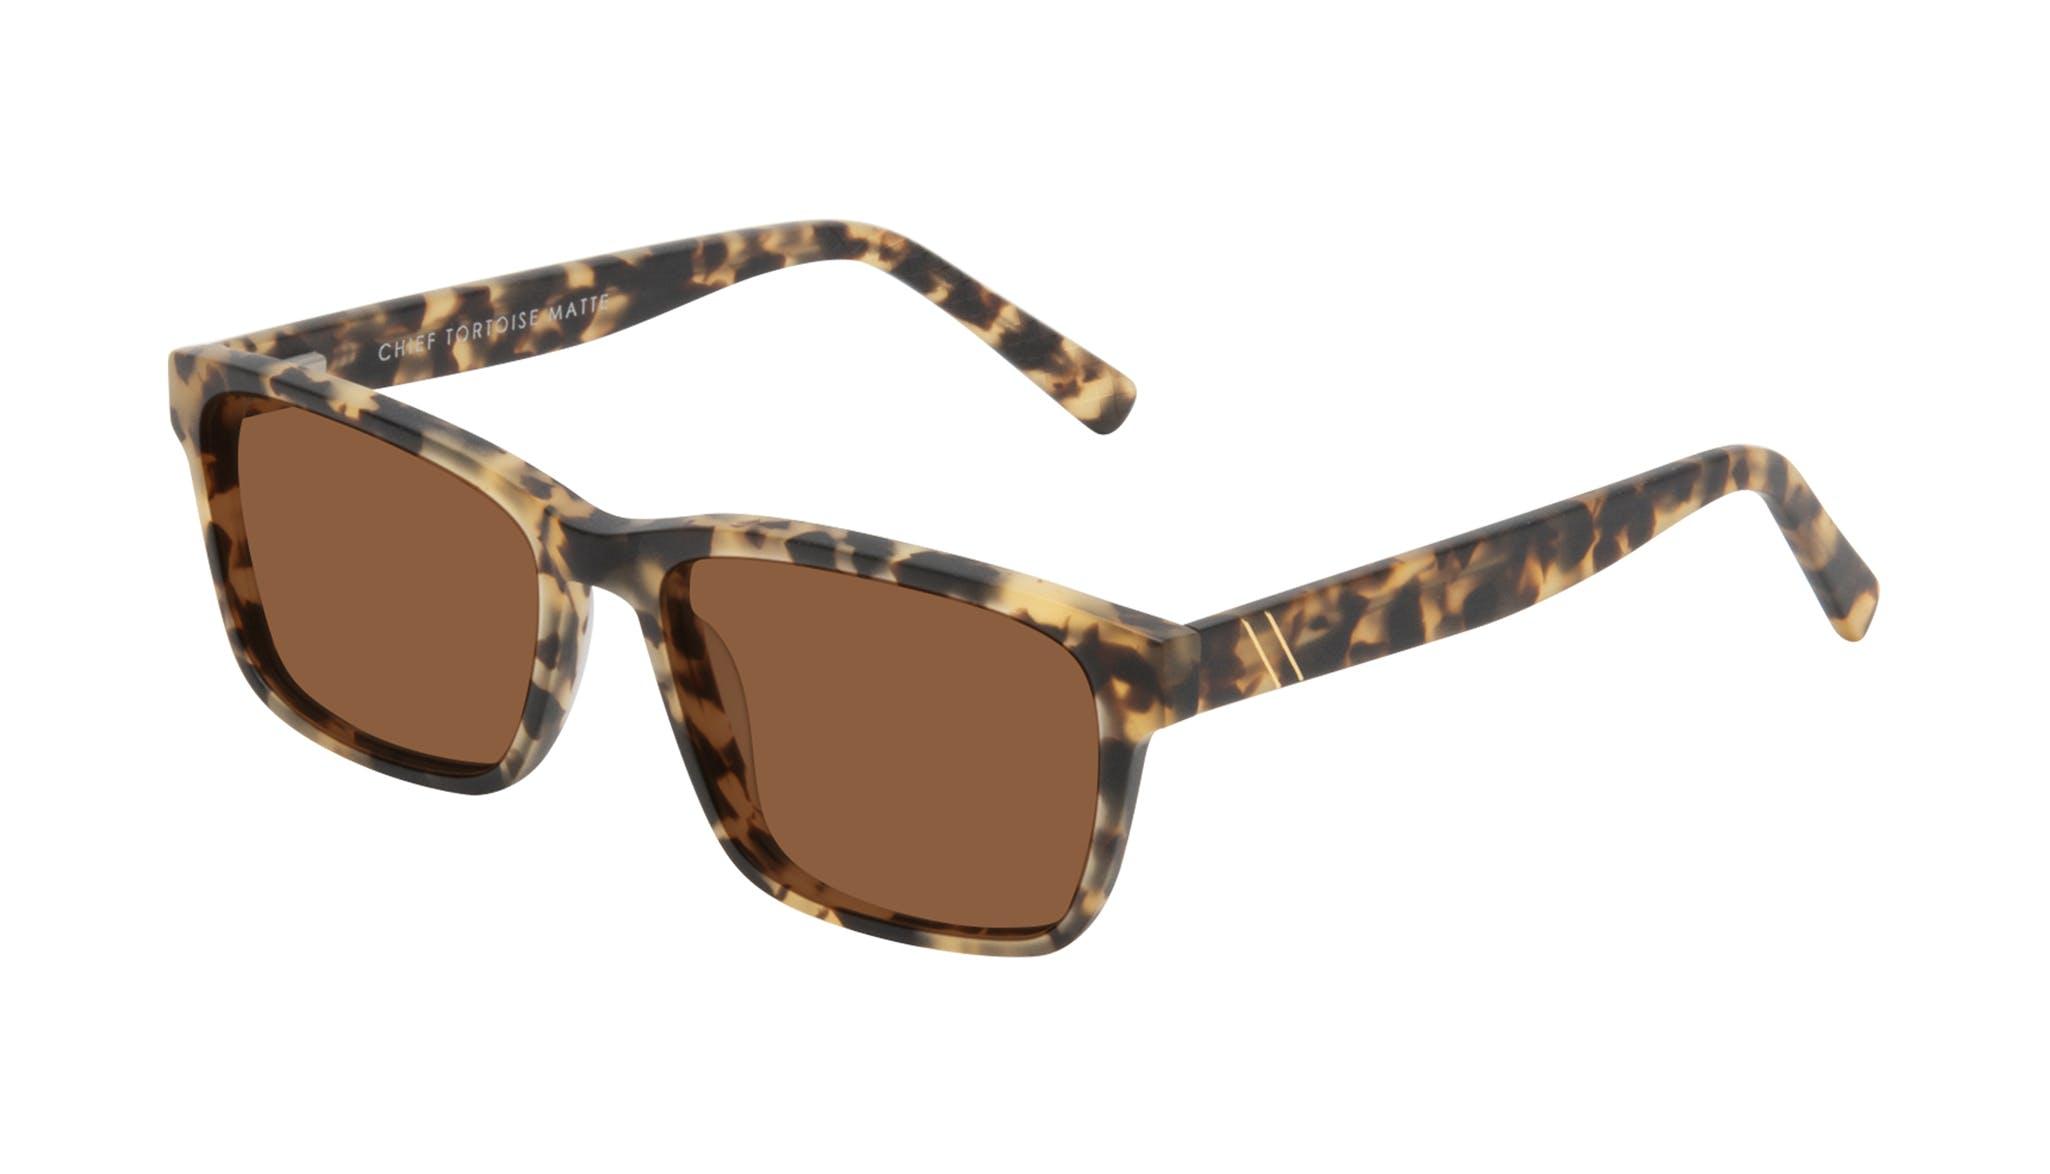 Affordable Fashion Glasses Square Sunglasses Men Chief Tortoise Matte Tilt